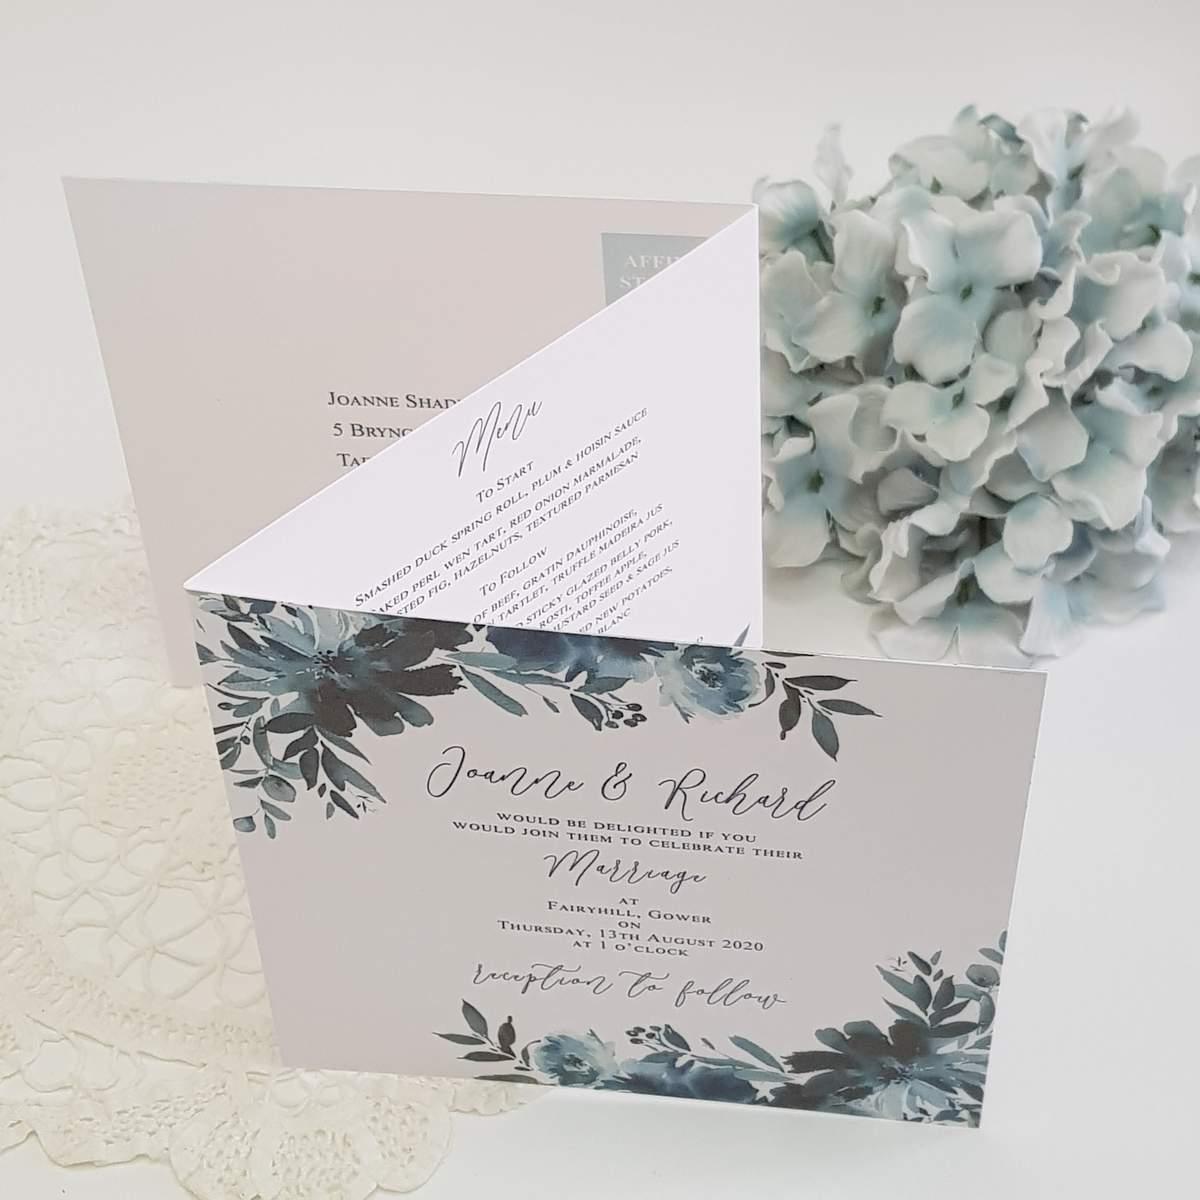 concertina wedding invitation with navy flowers